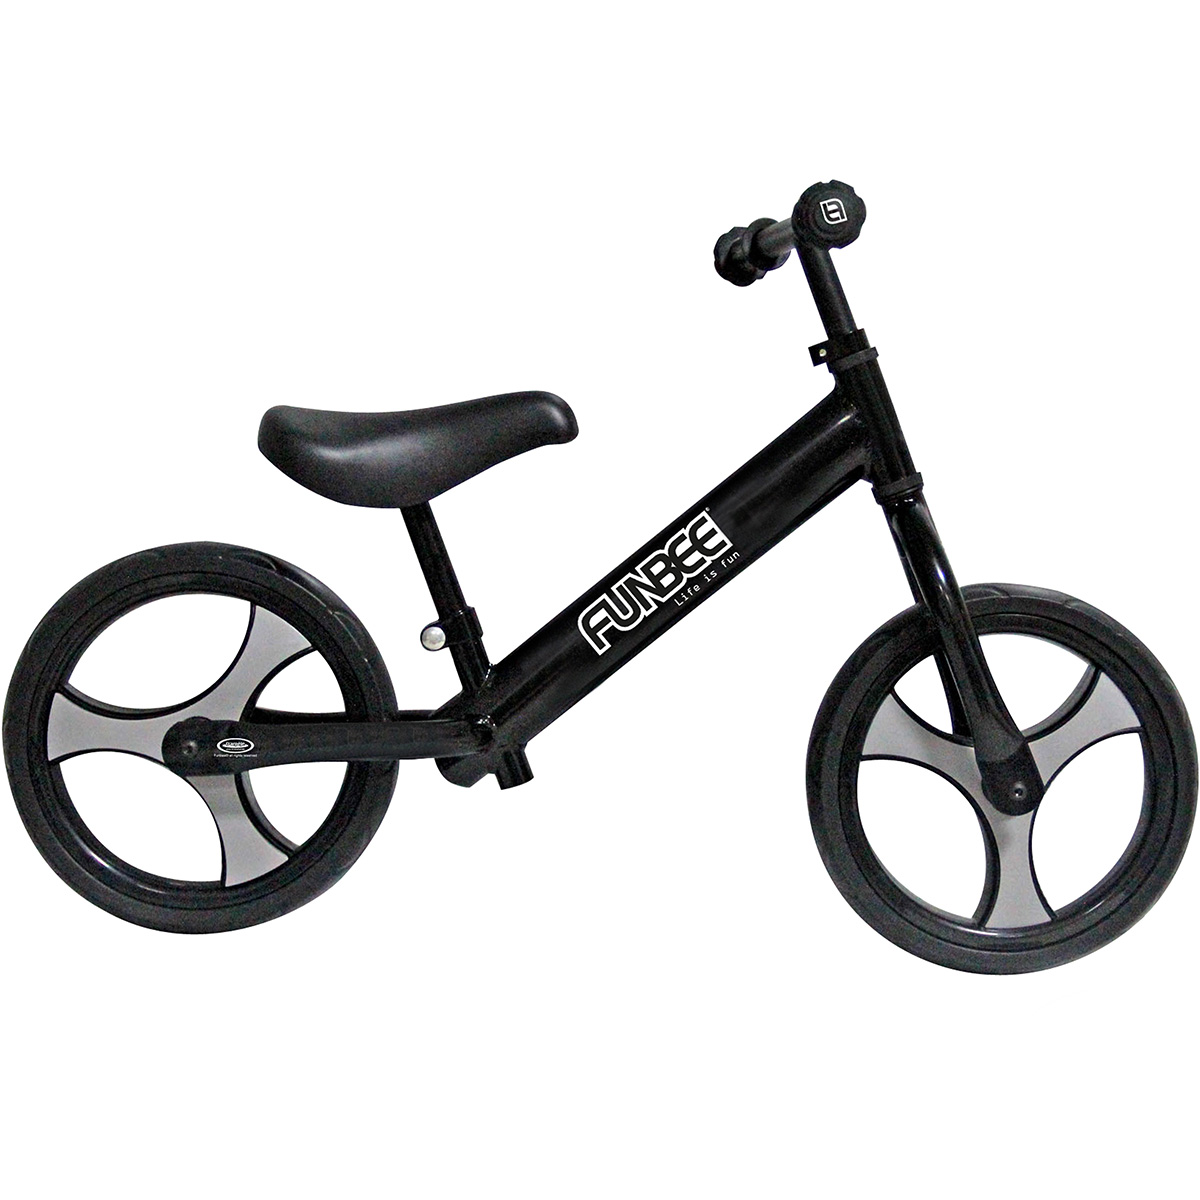 Bicicleta vintage fara pedale Funbee, Negru, 12 inch